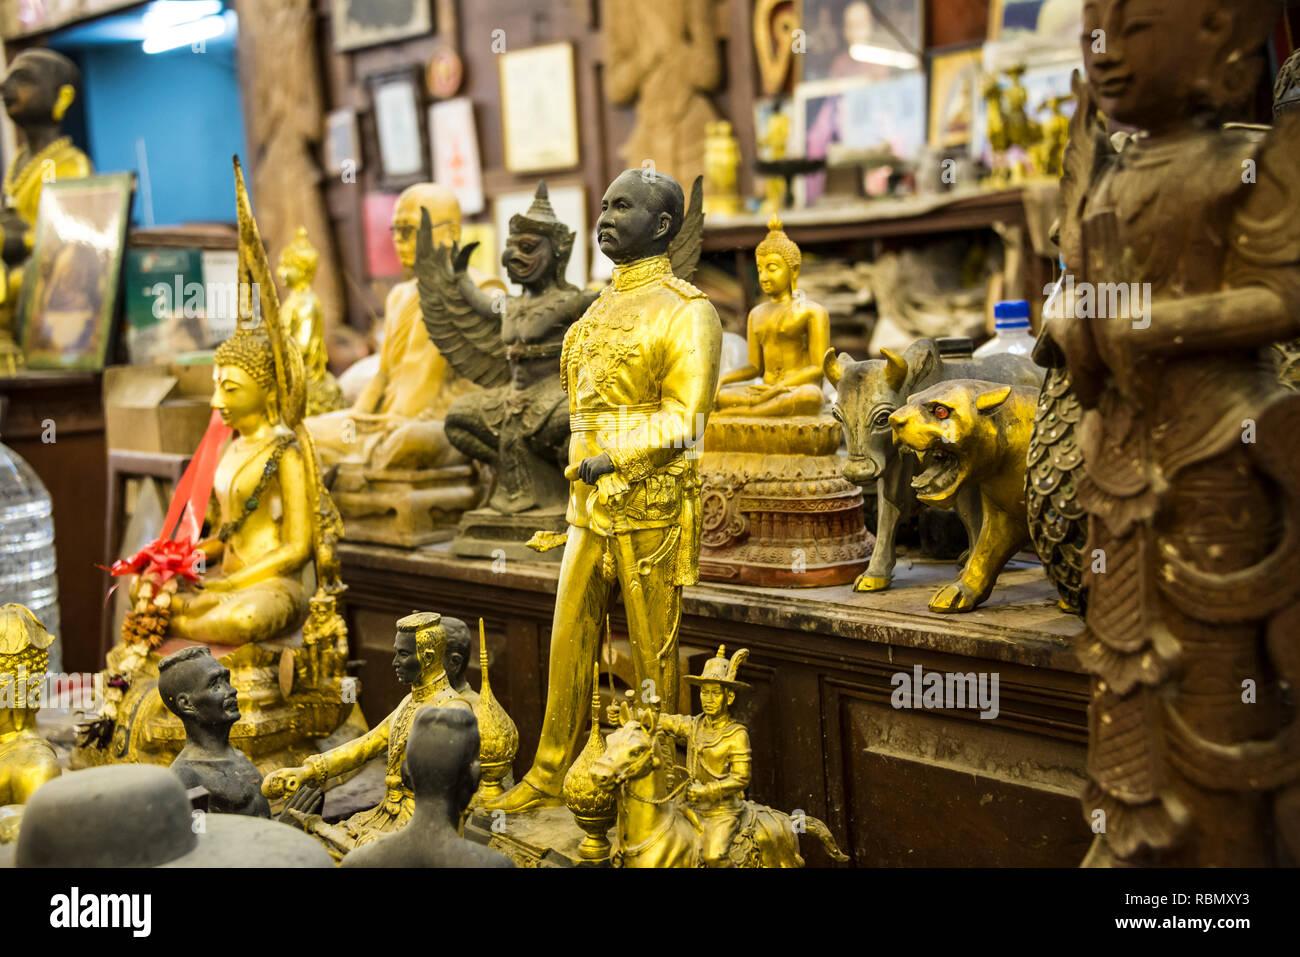 Antique shop in Patong Phuket Thailand. 15 December 2018 - Stock Image